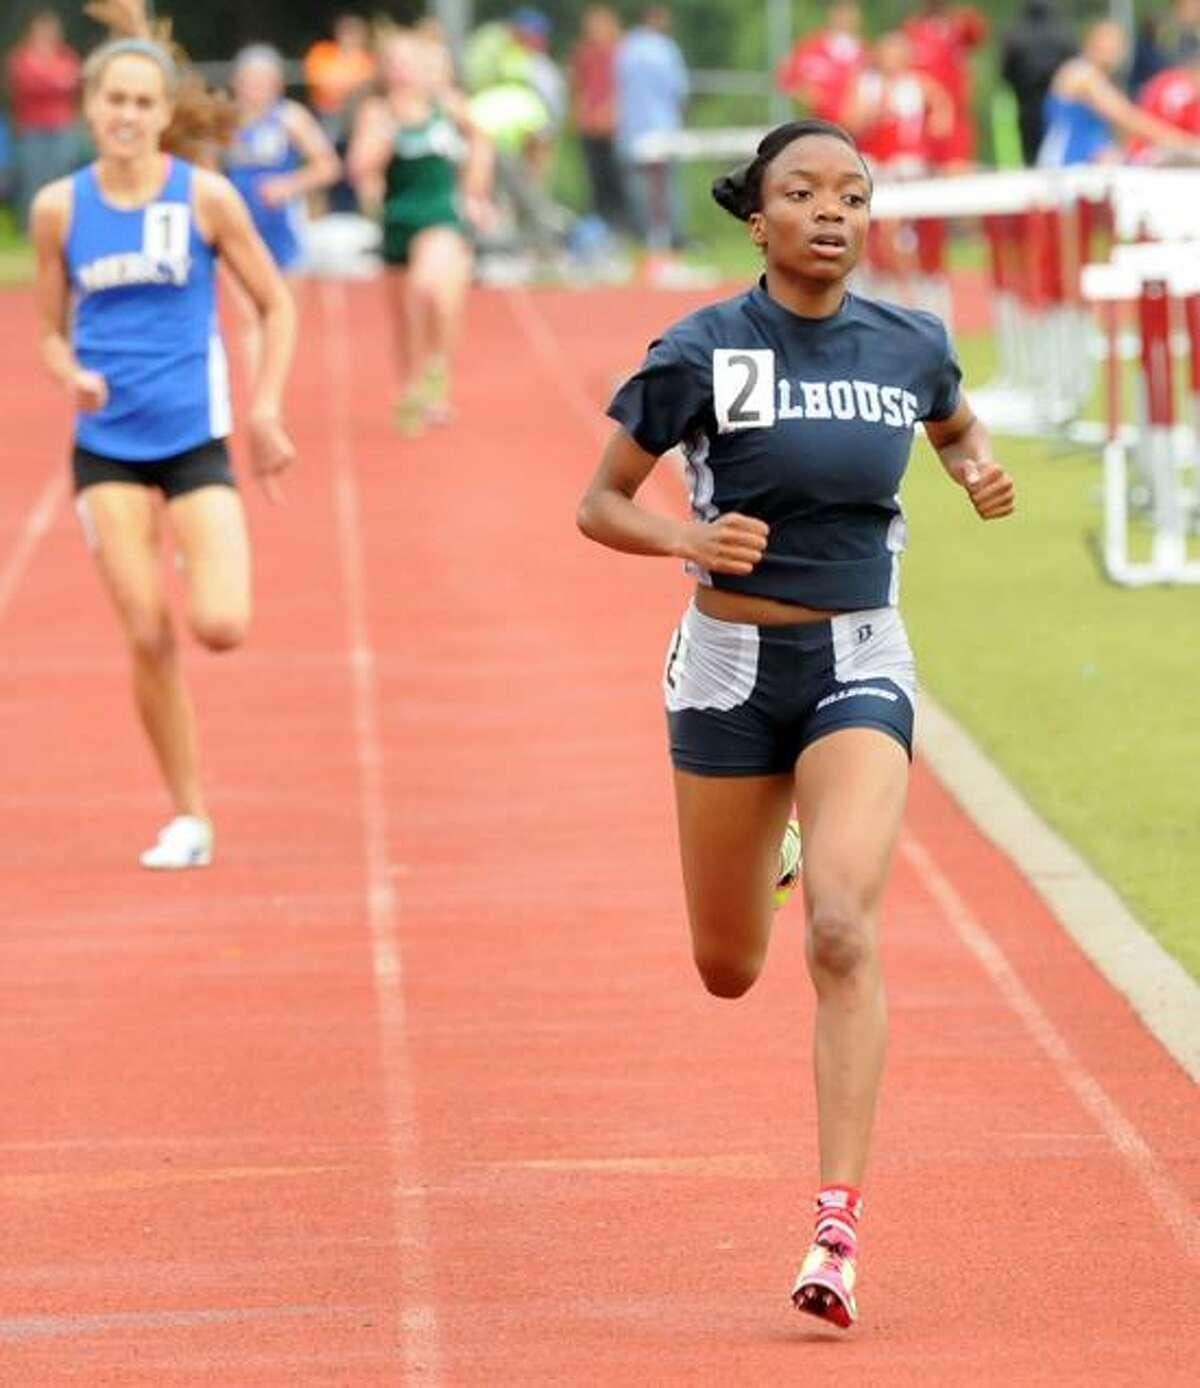 SCC Track championships, Sheehan H.S. Wallingford: Hillhouse's Kellie Davis won the 1600m in 5:07.33. Mara Lavitt/New Haven Register5/21/12